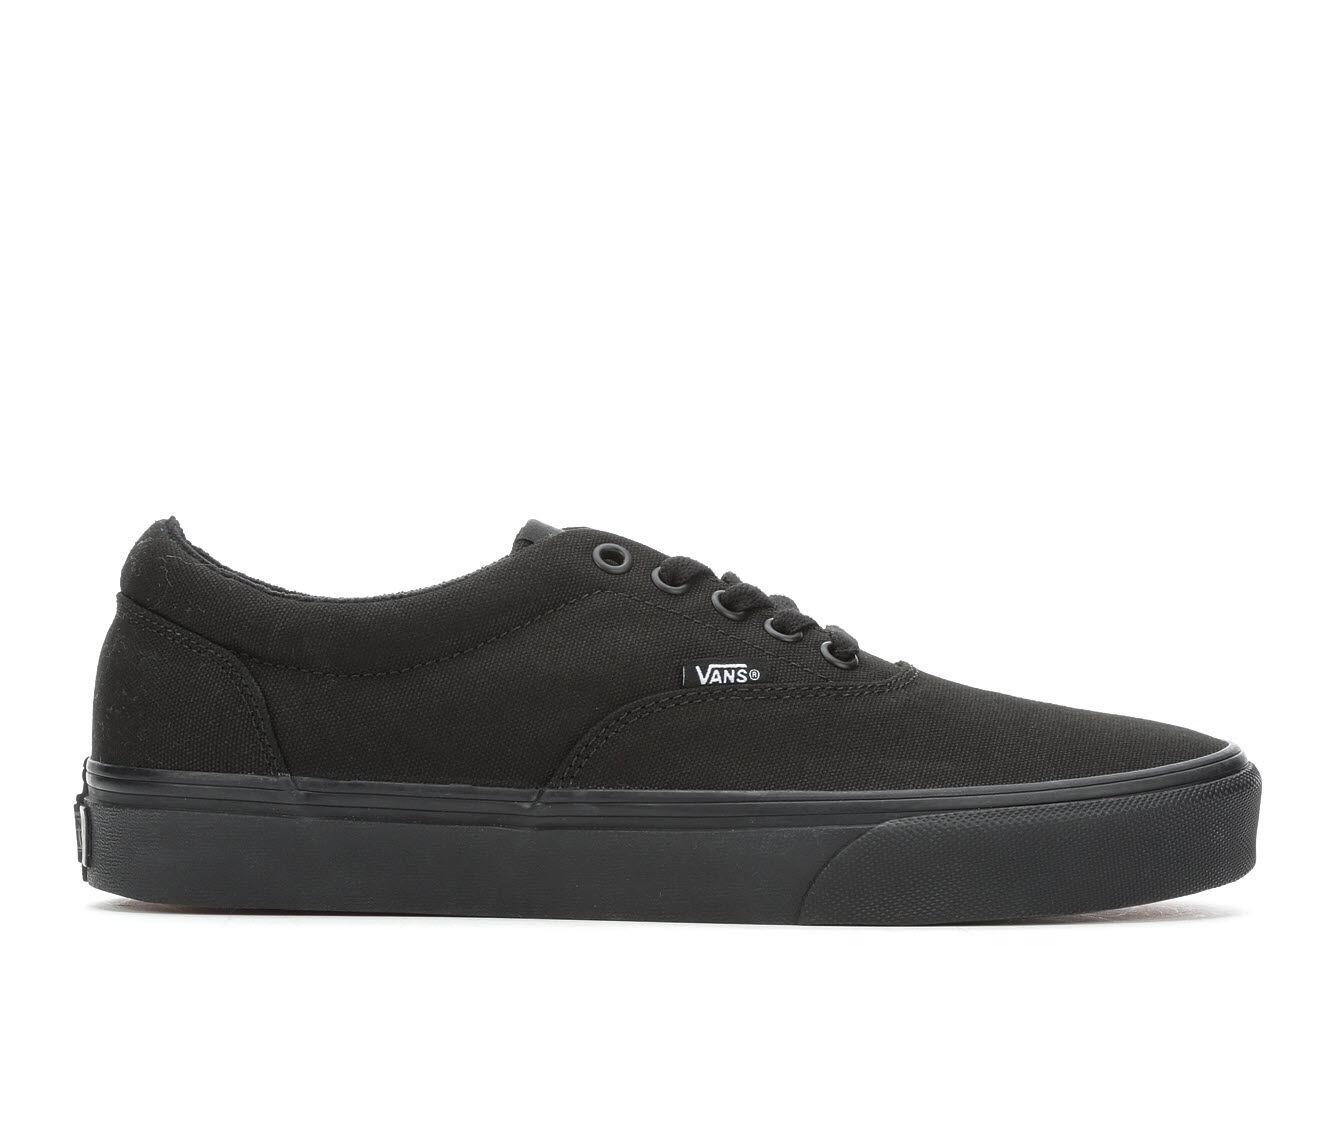 Men's Vans Doheny Skate Shoes Black/Black